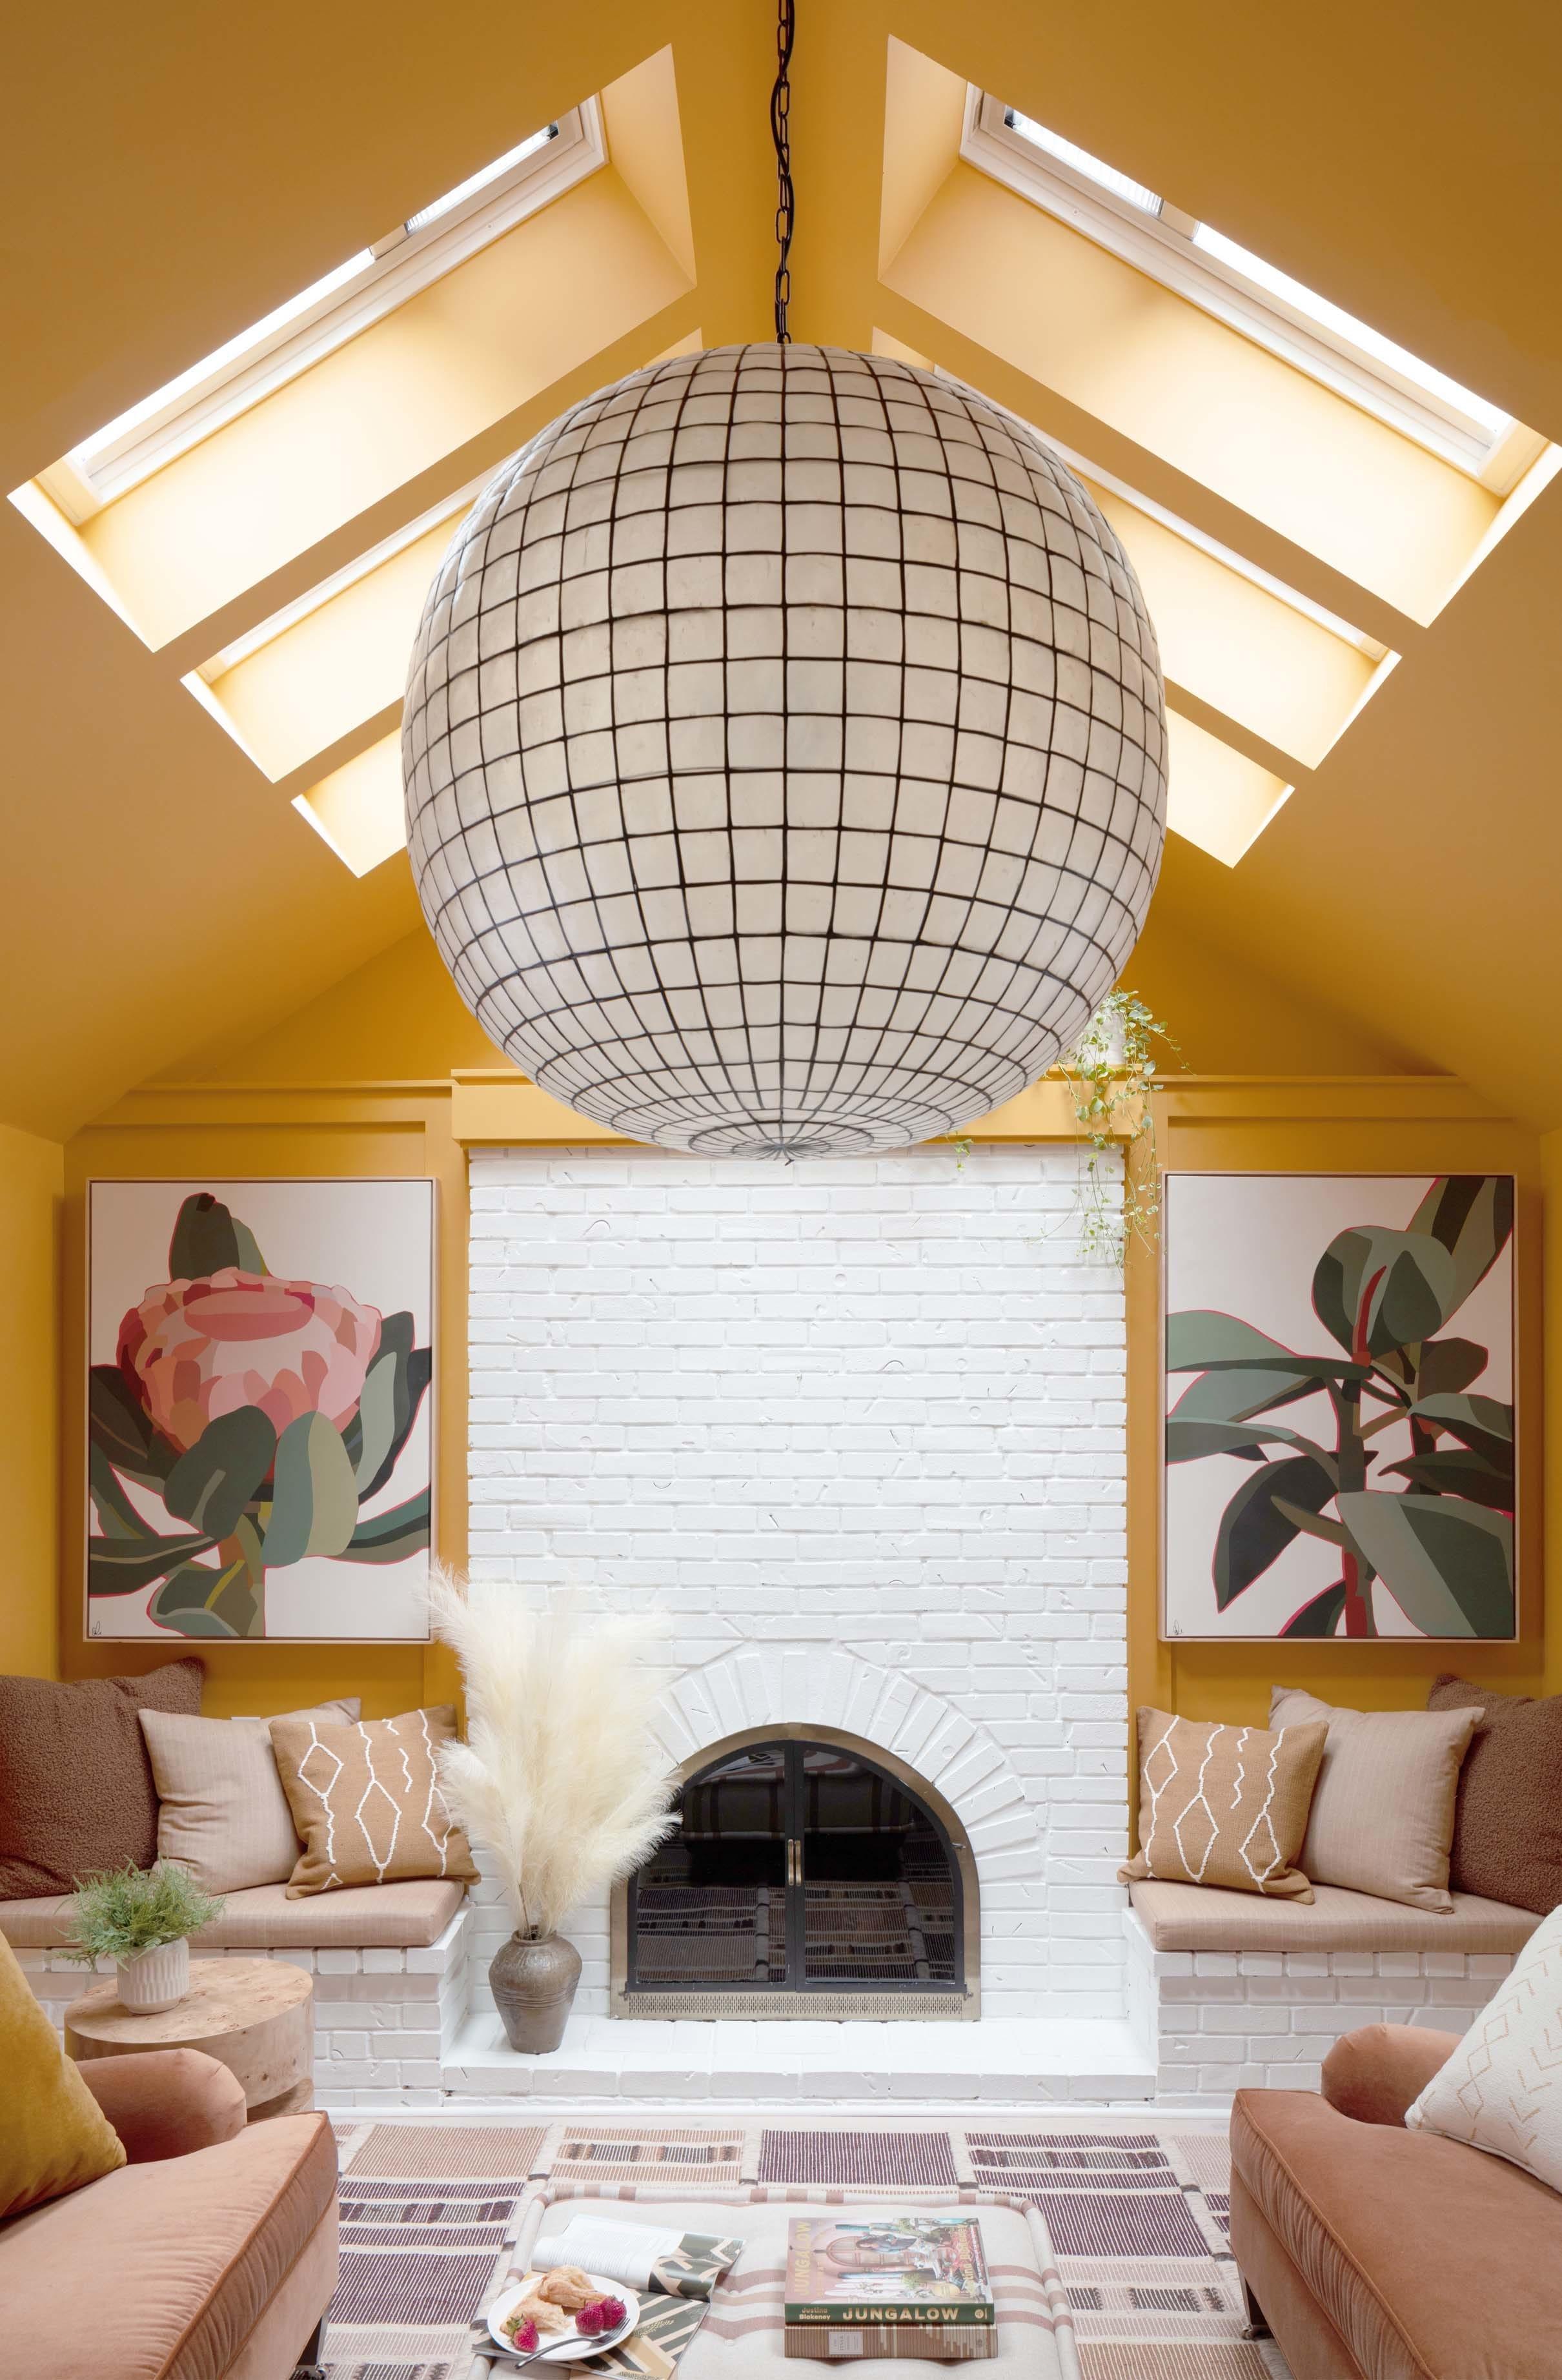 Living room skylights yellow walls